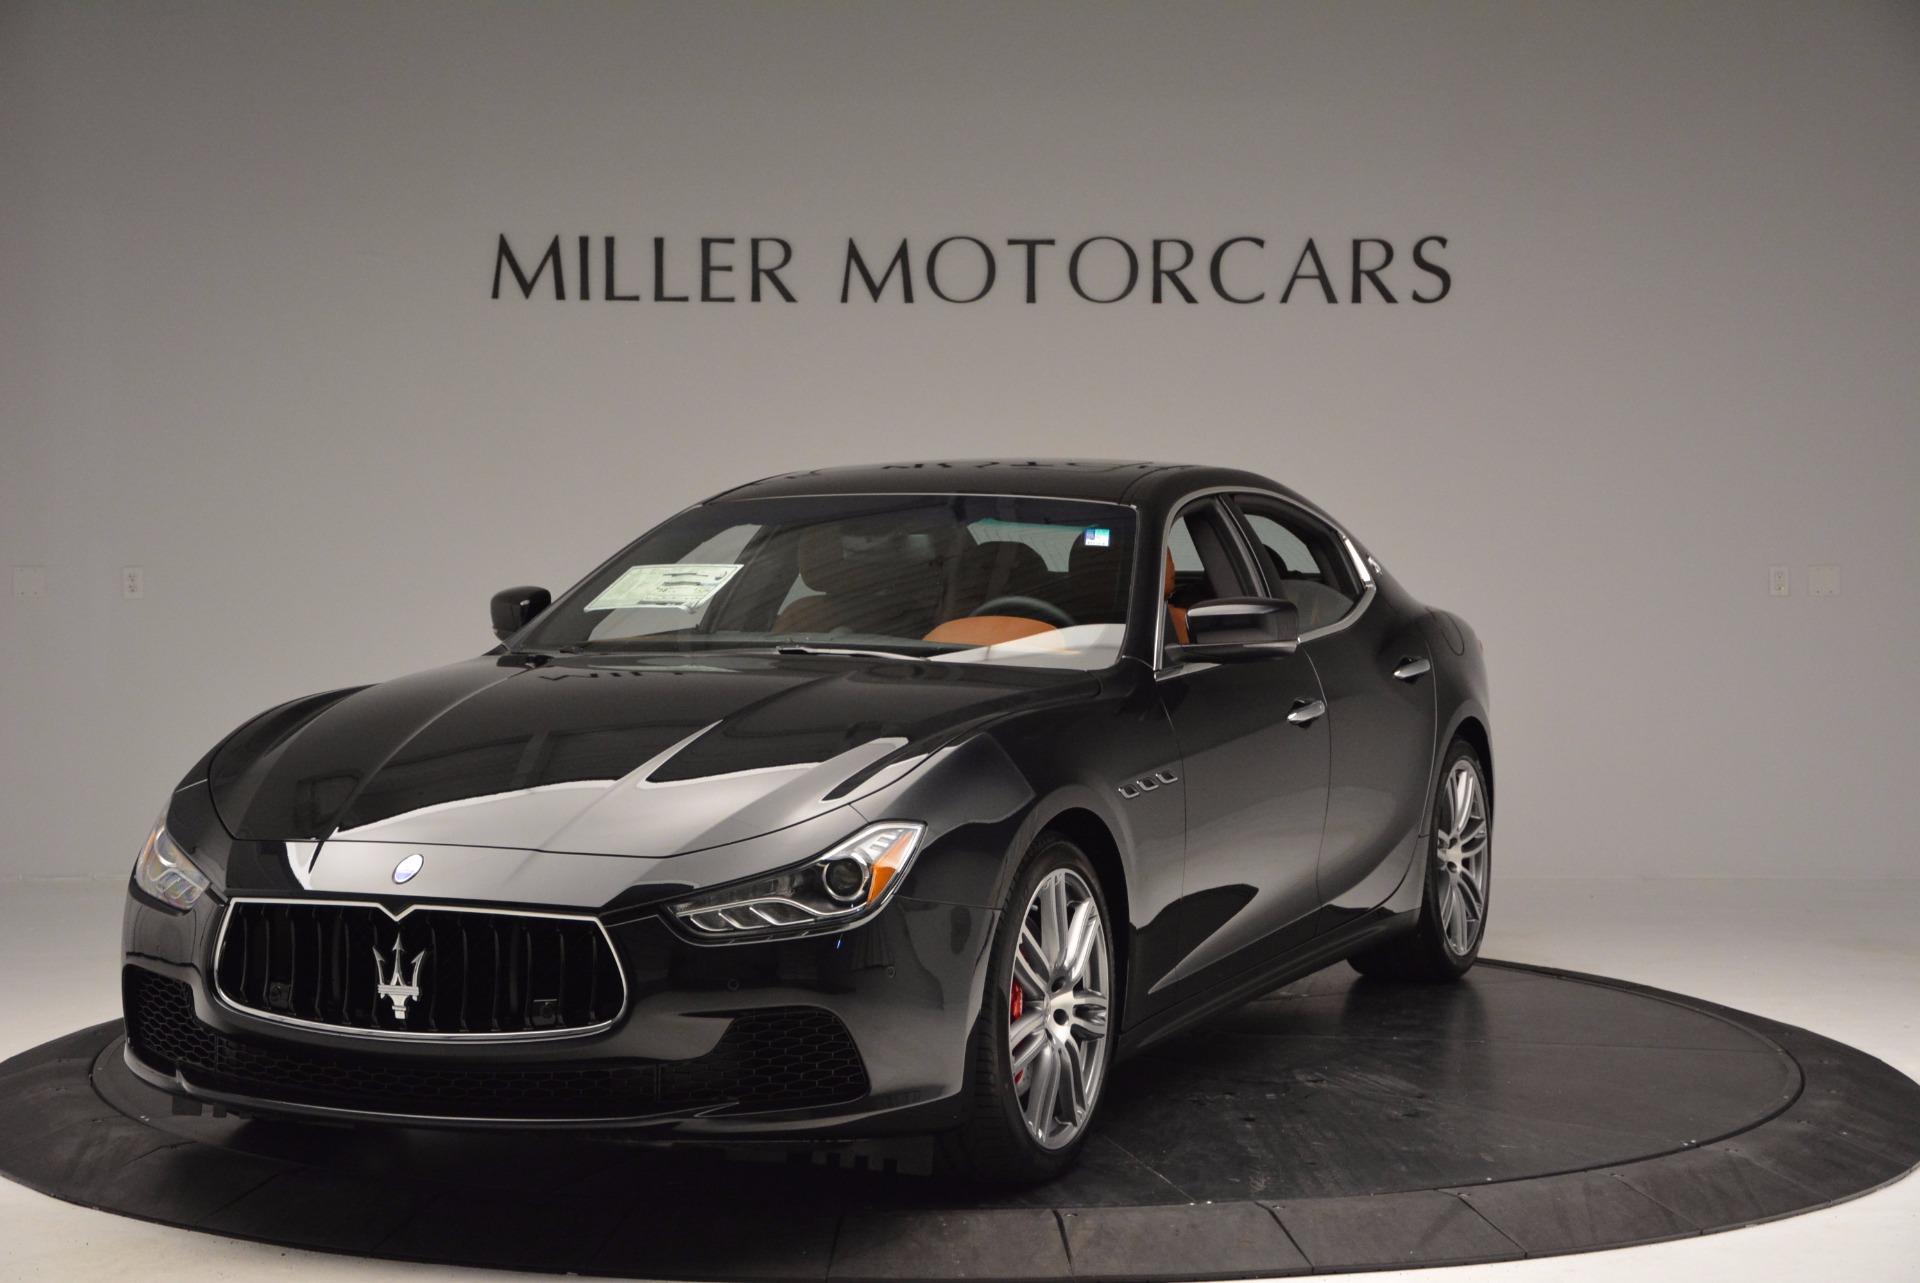 Used 2017 Maserati Ghibli S Q4 For Sale In Greenwich, CT. Alfa Romeo of Greenwich, M1711 682_main